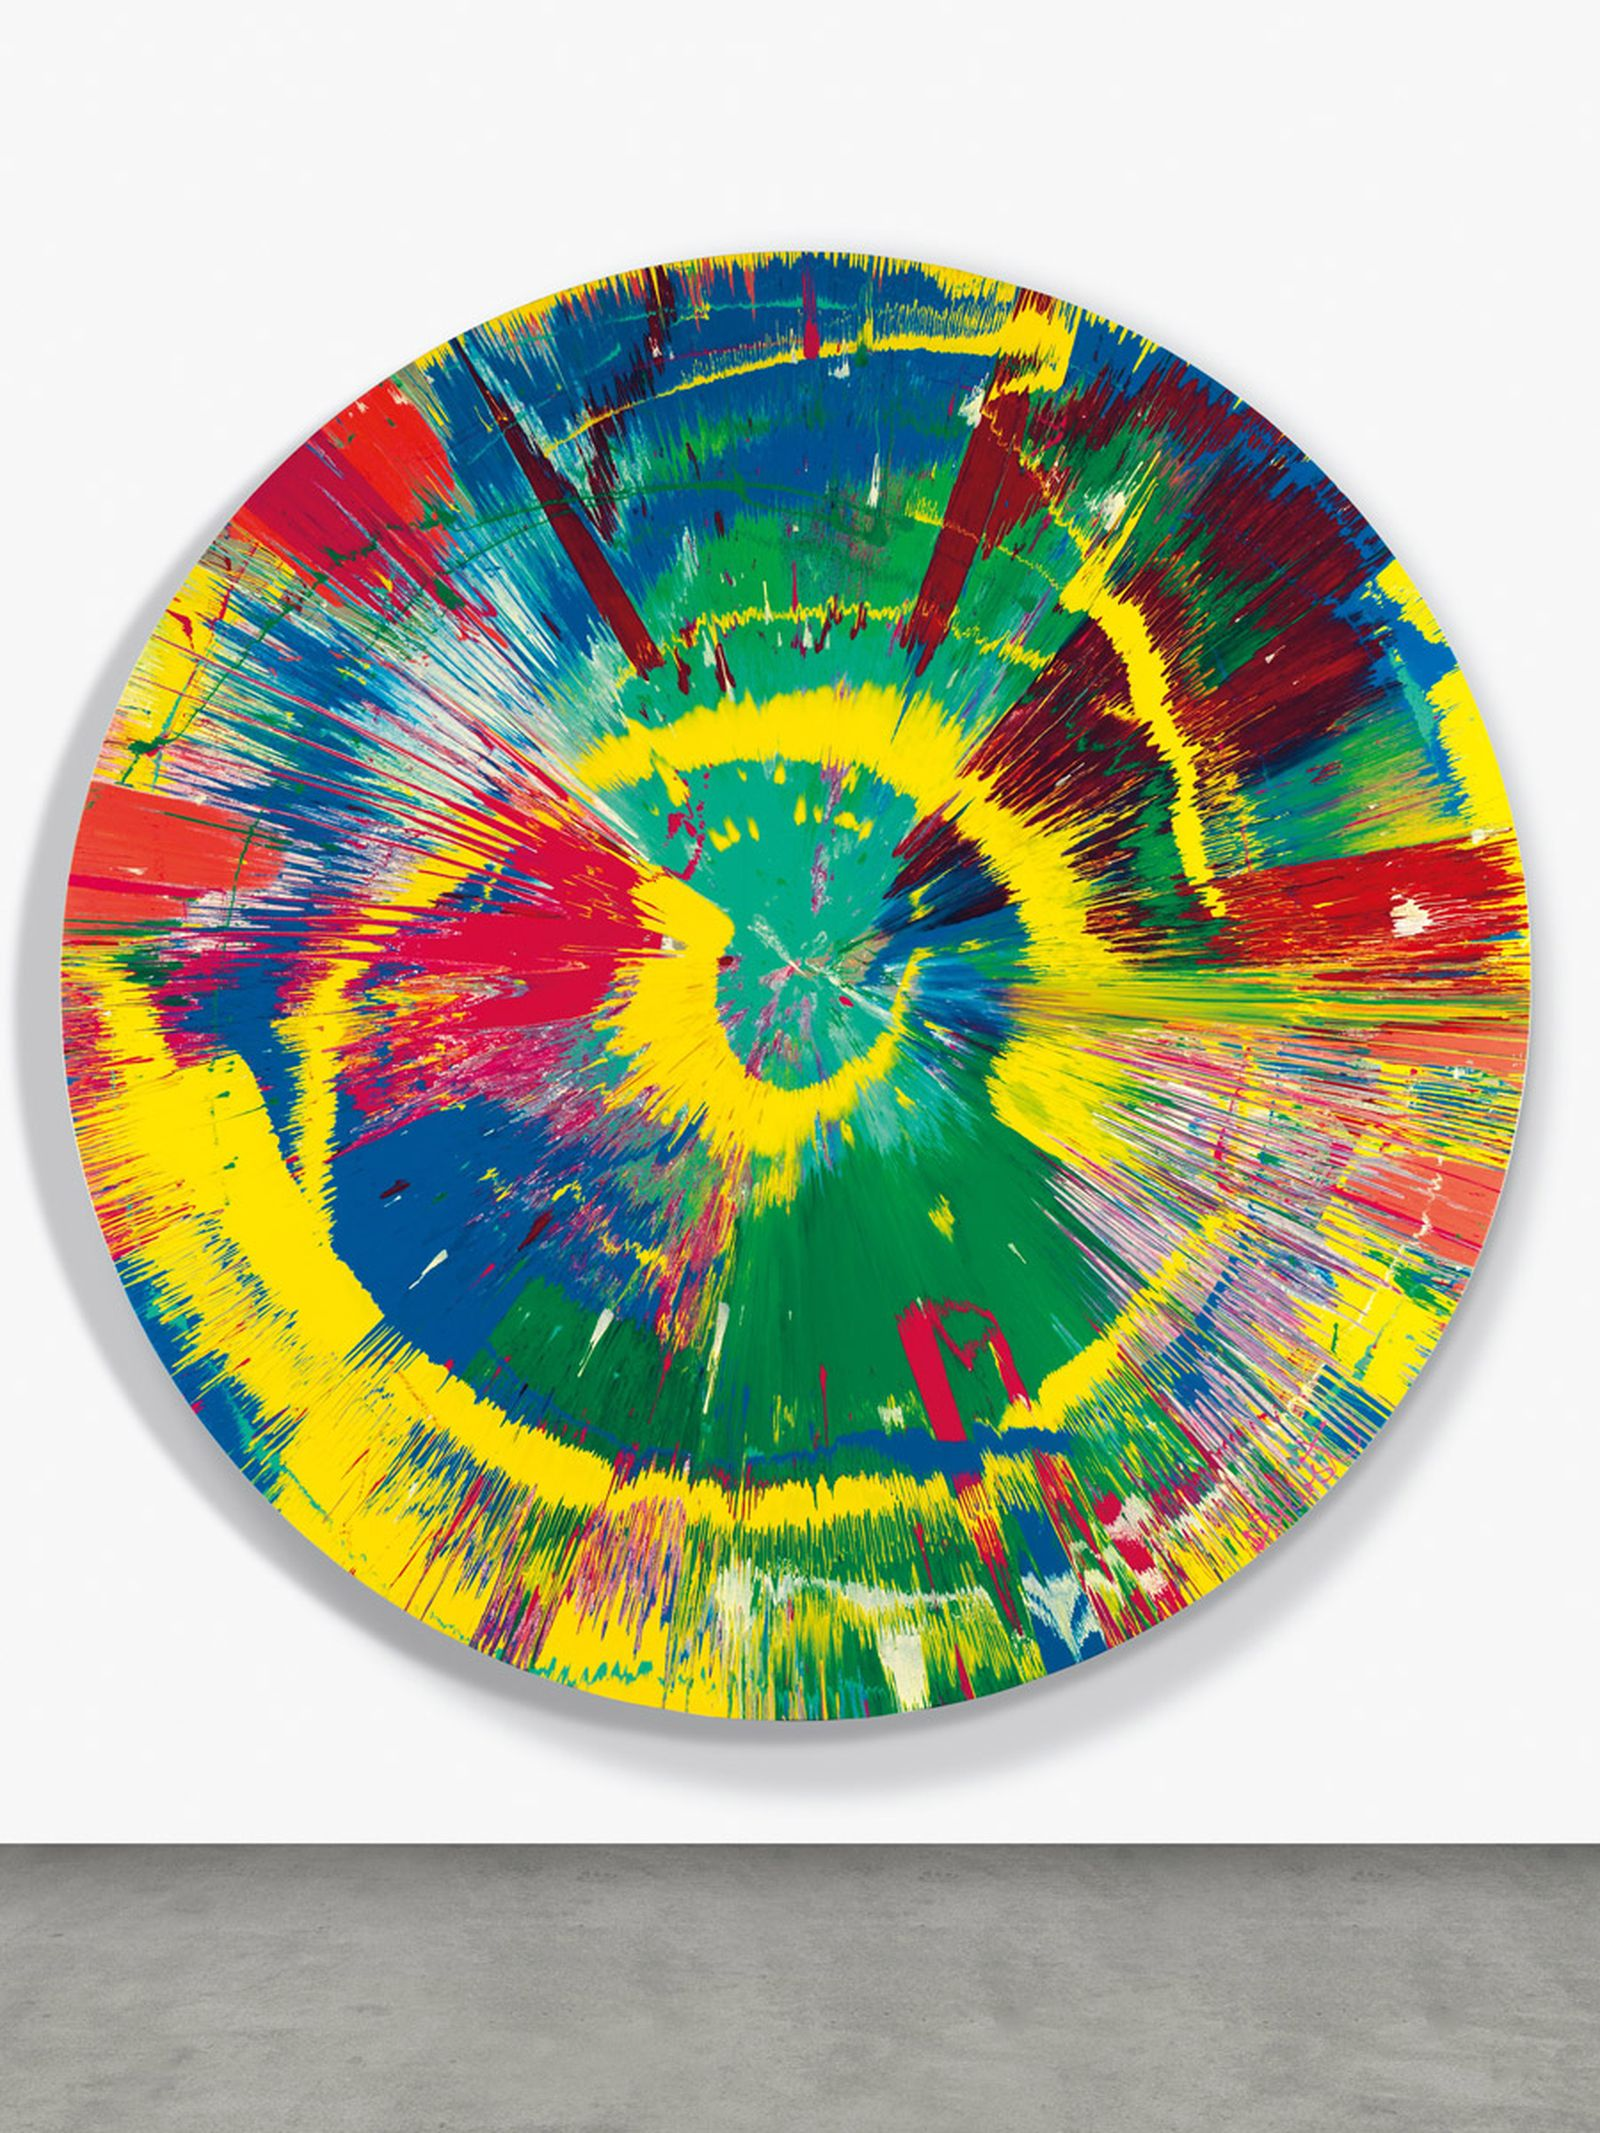 fai-khadra-sothebys-contemporay-curated-auction-03